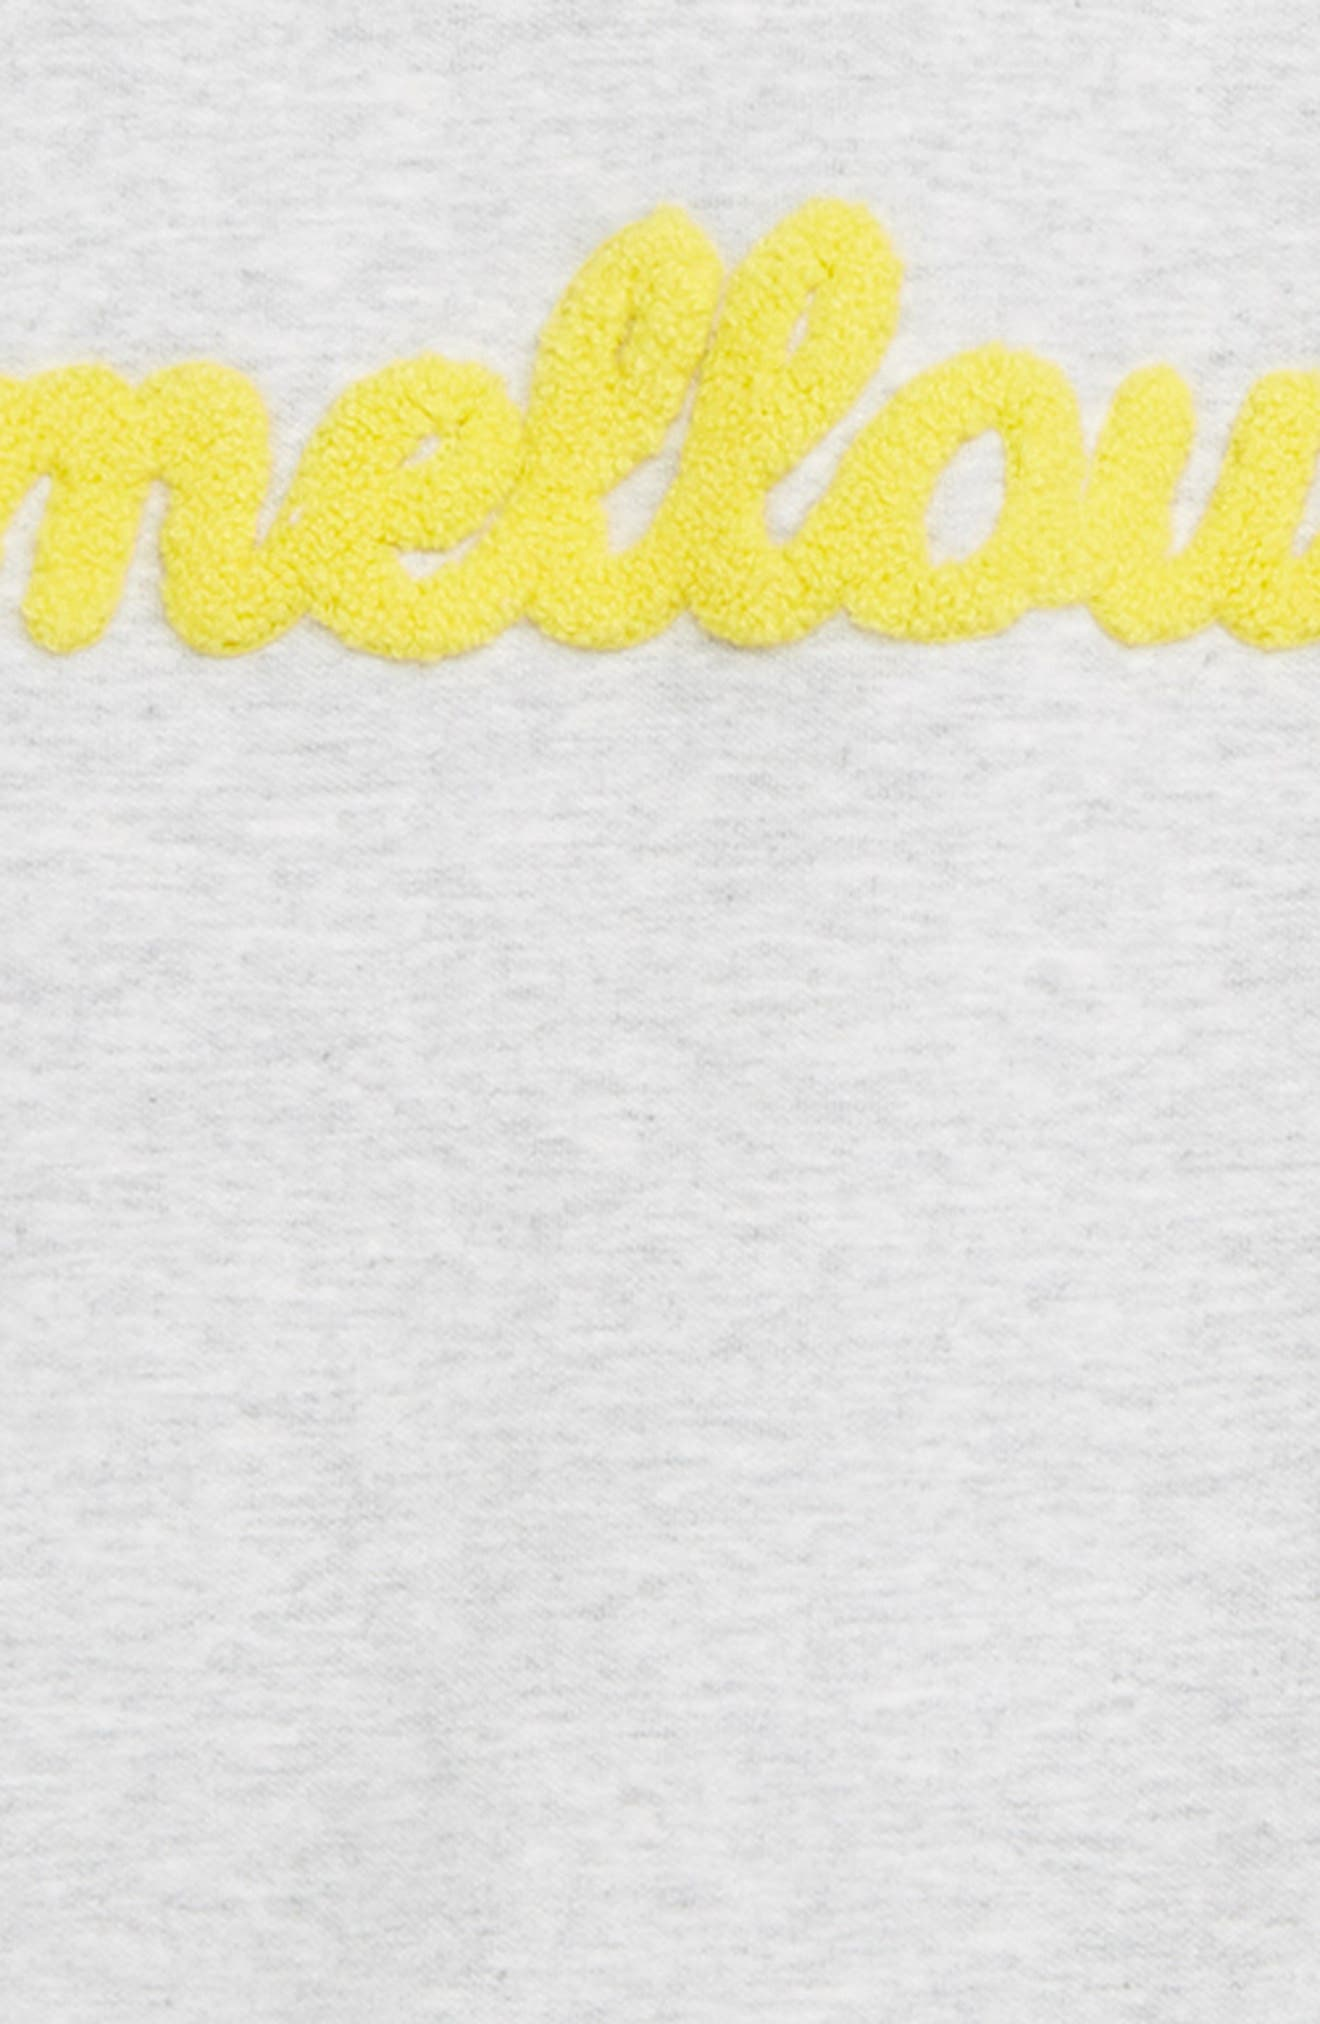 Flare Sleeve Sweatshirt,                             Alternate thumbnail 2, color,                             GREY ASH HEATHER MELLOW